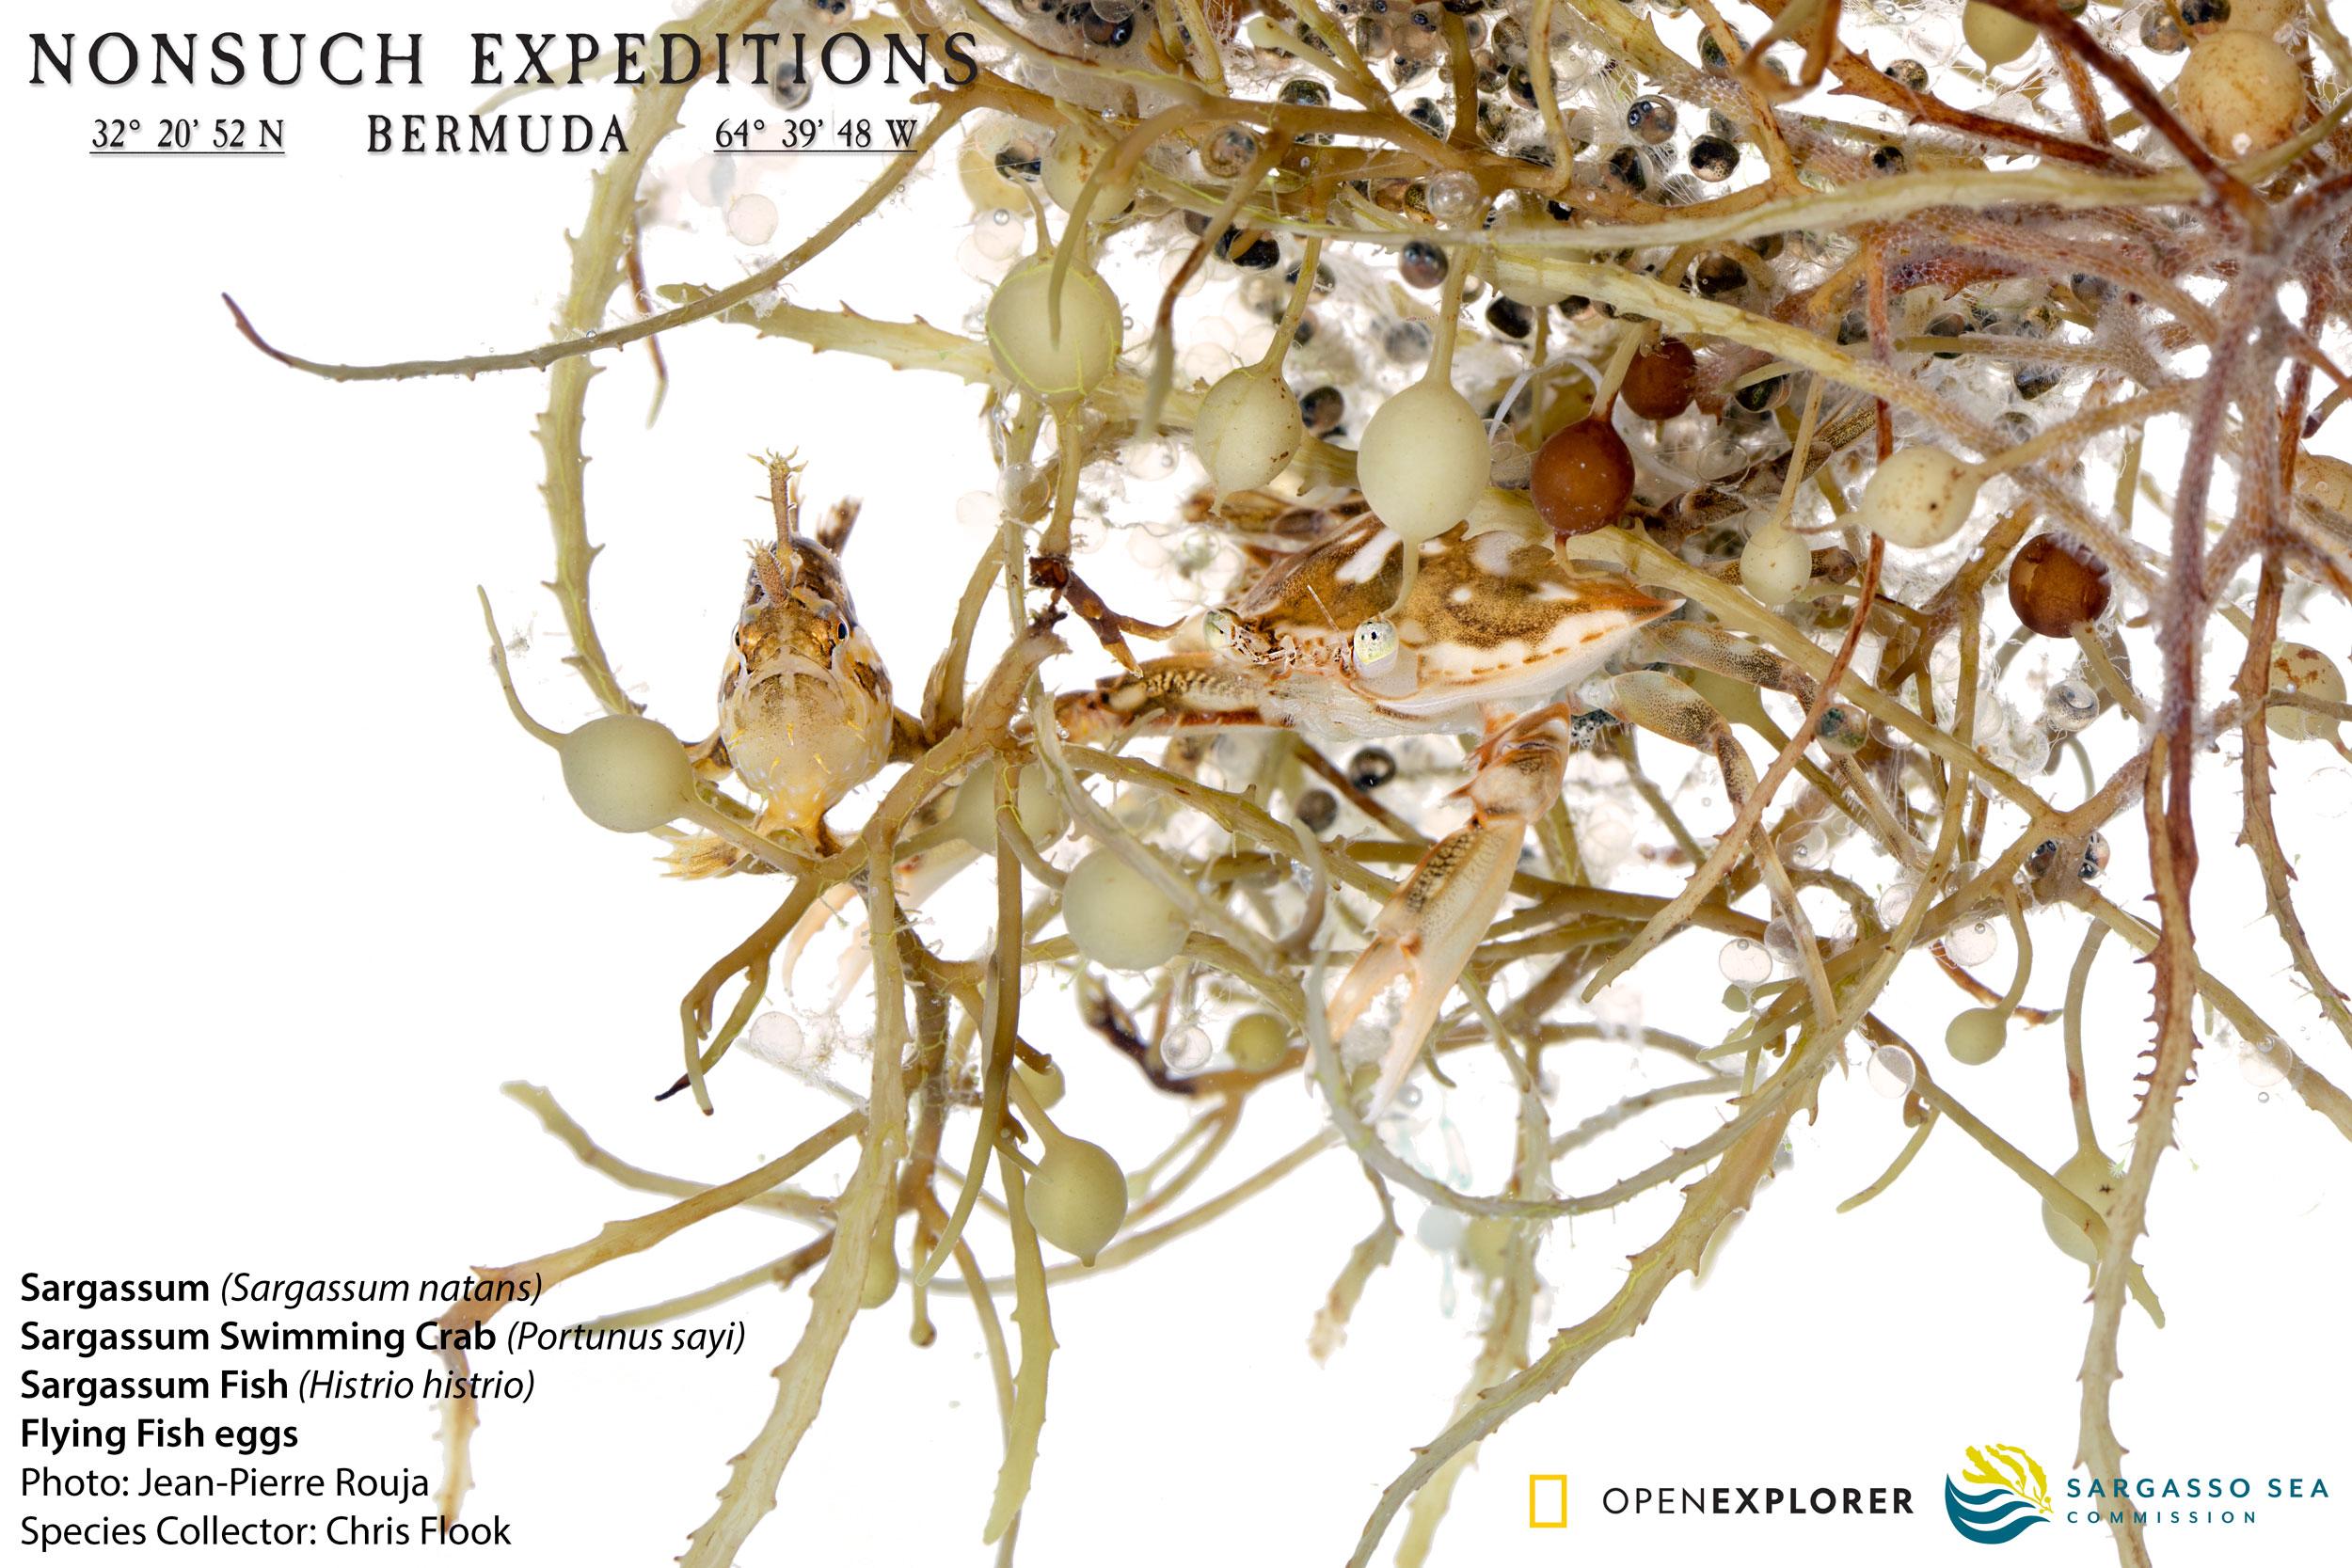 SargassumFish&Crab_G1A4339-crop_FB.jpg